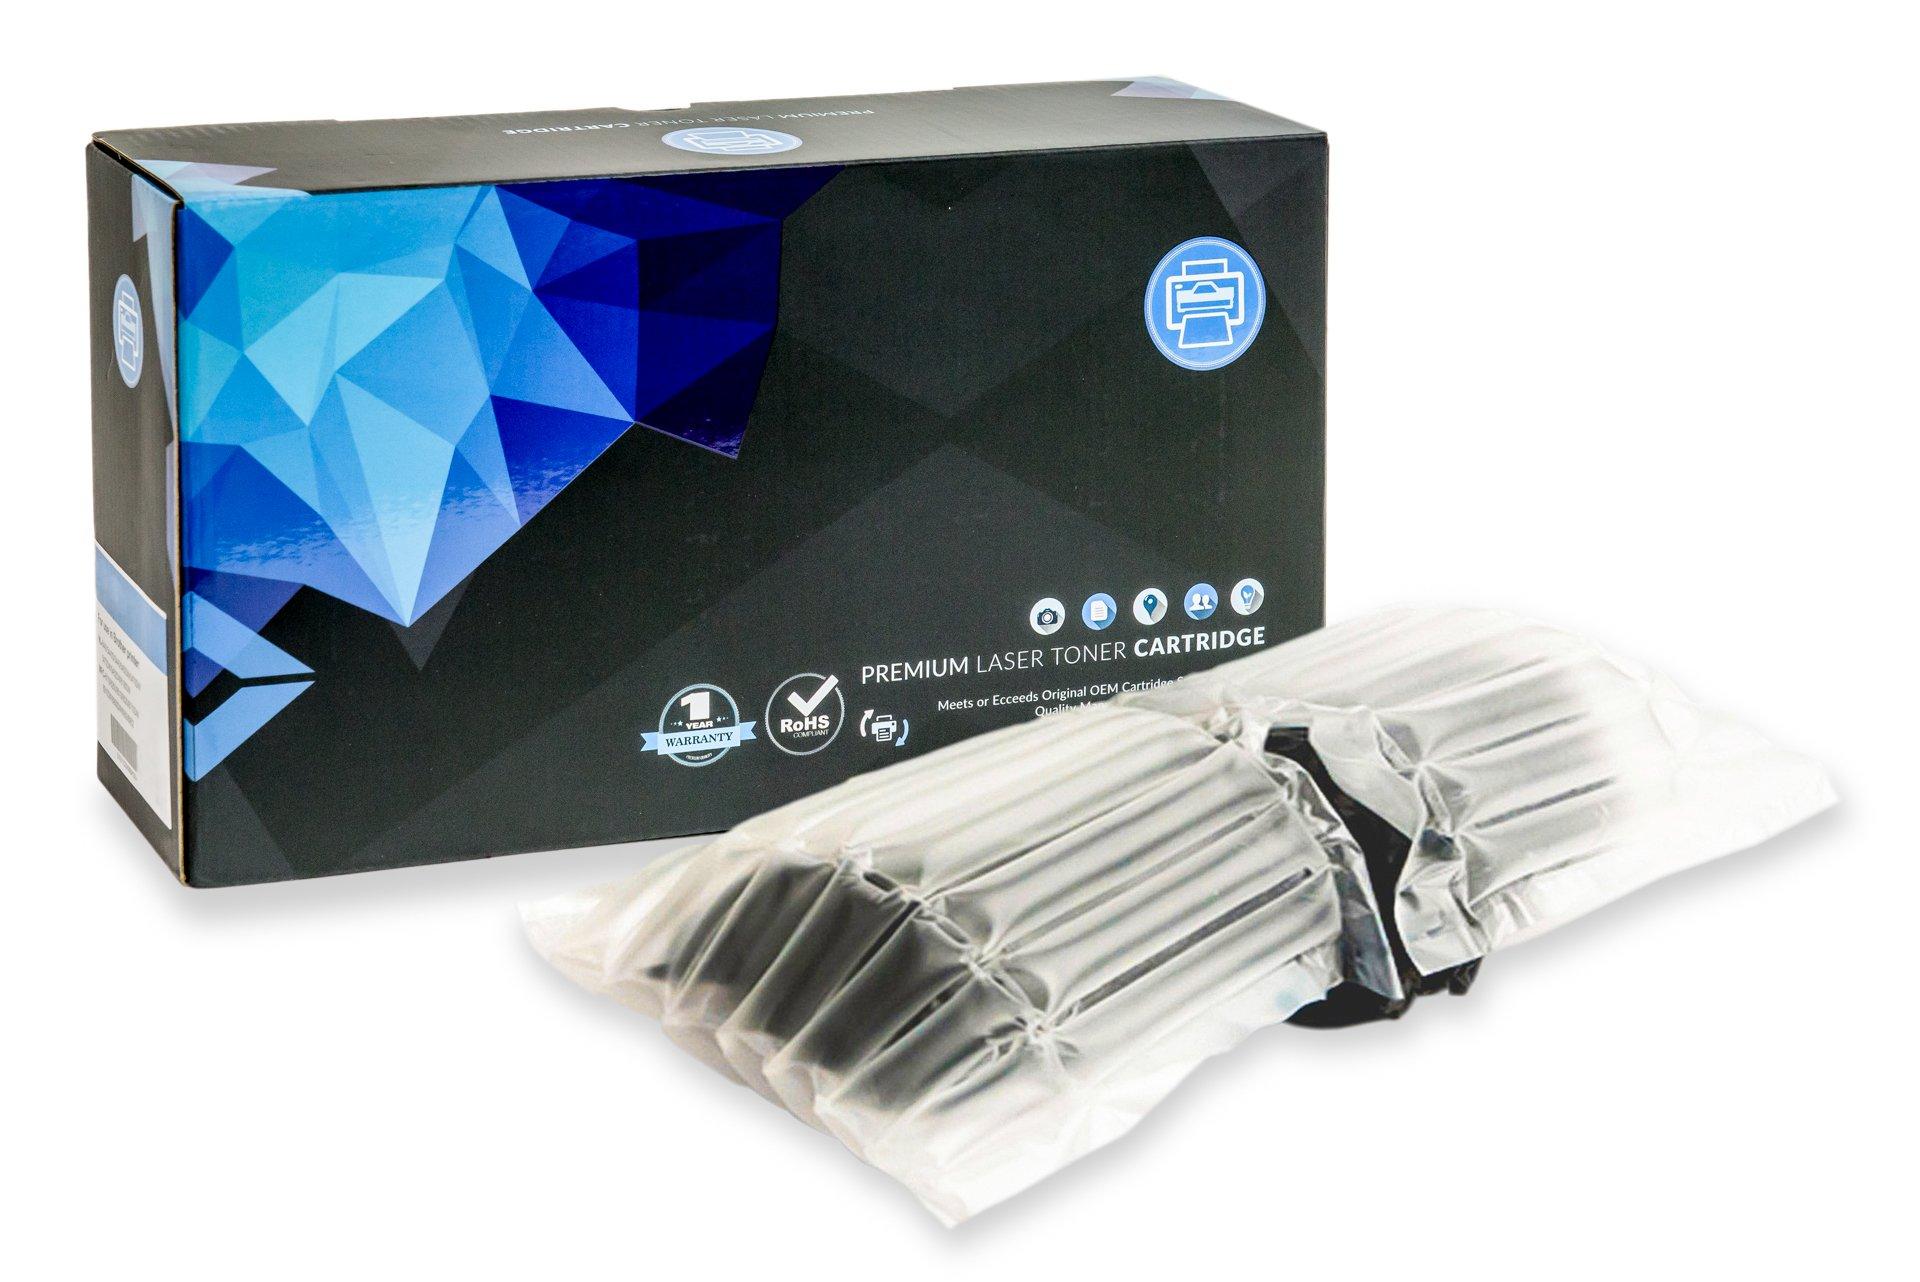 Premium New Compatible Drum Unit Cartridge replacement for HP Q3964A